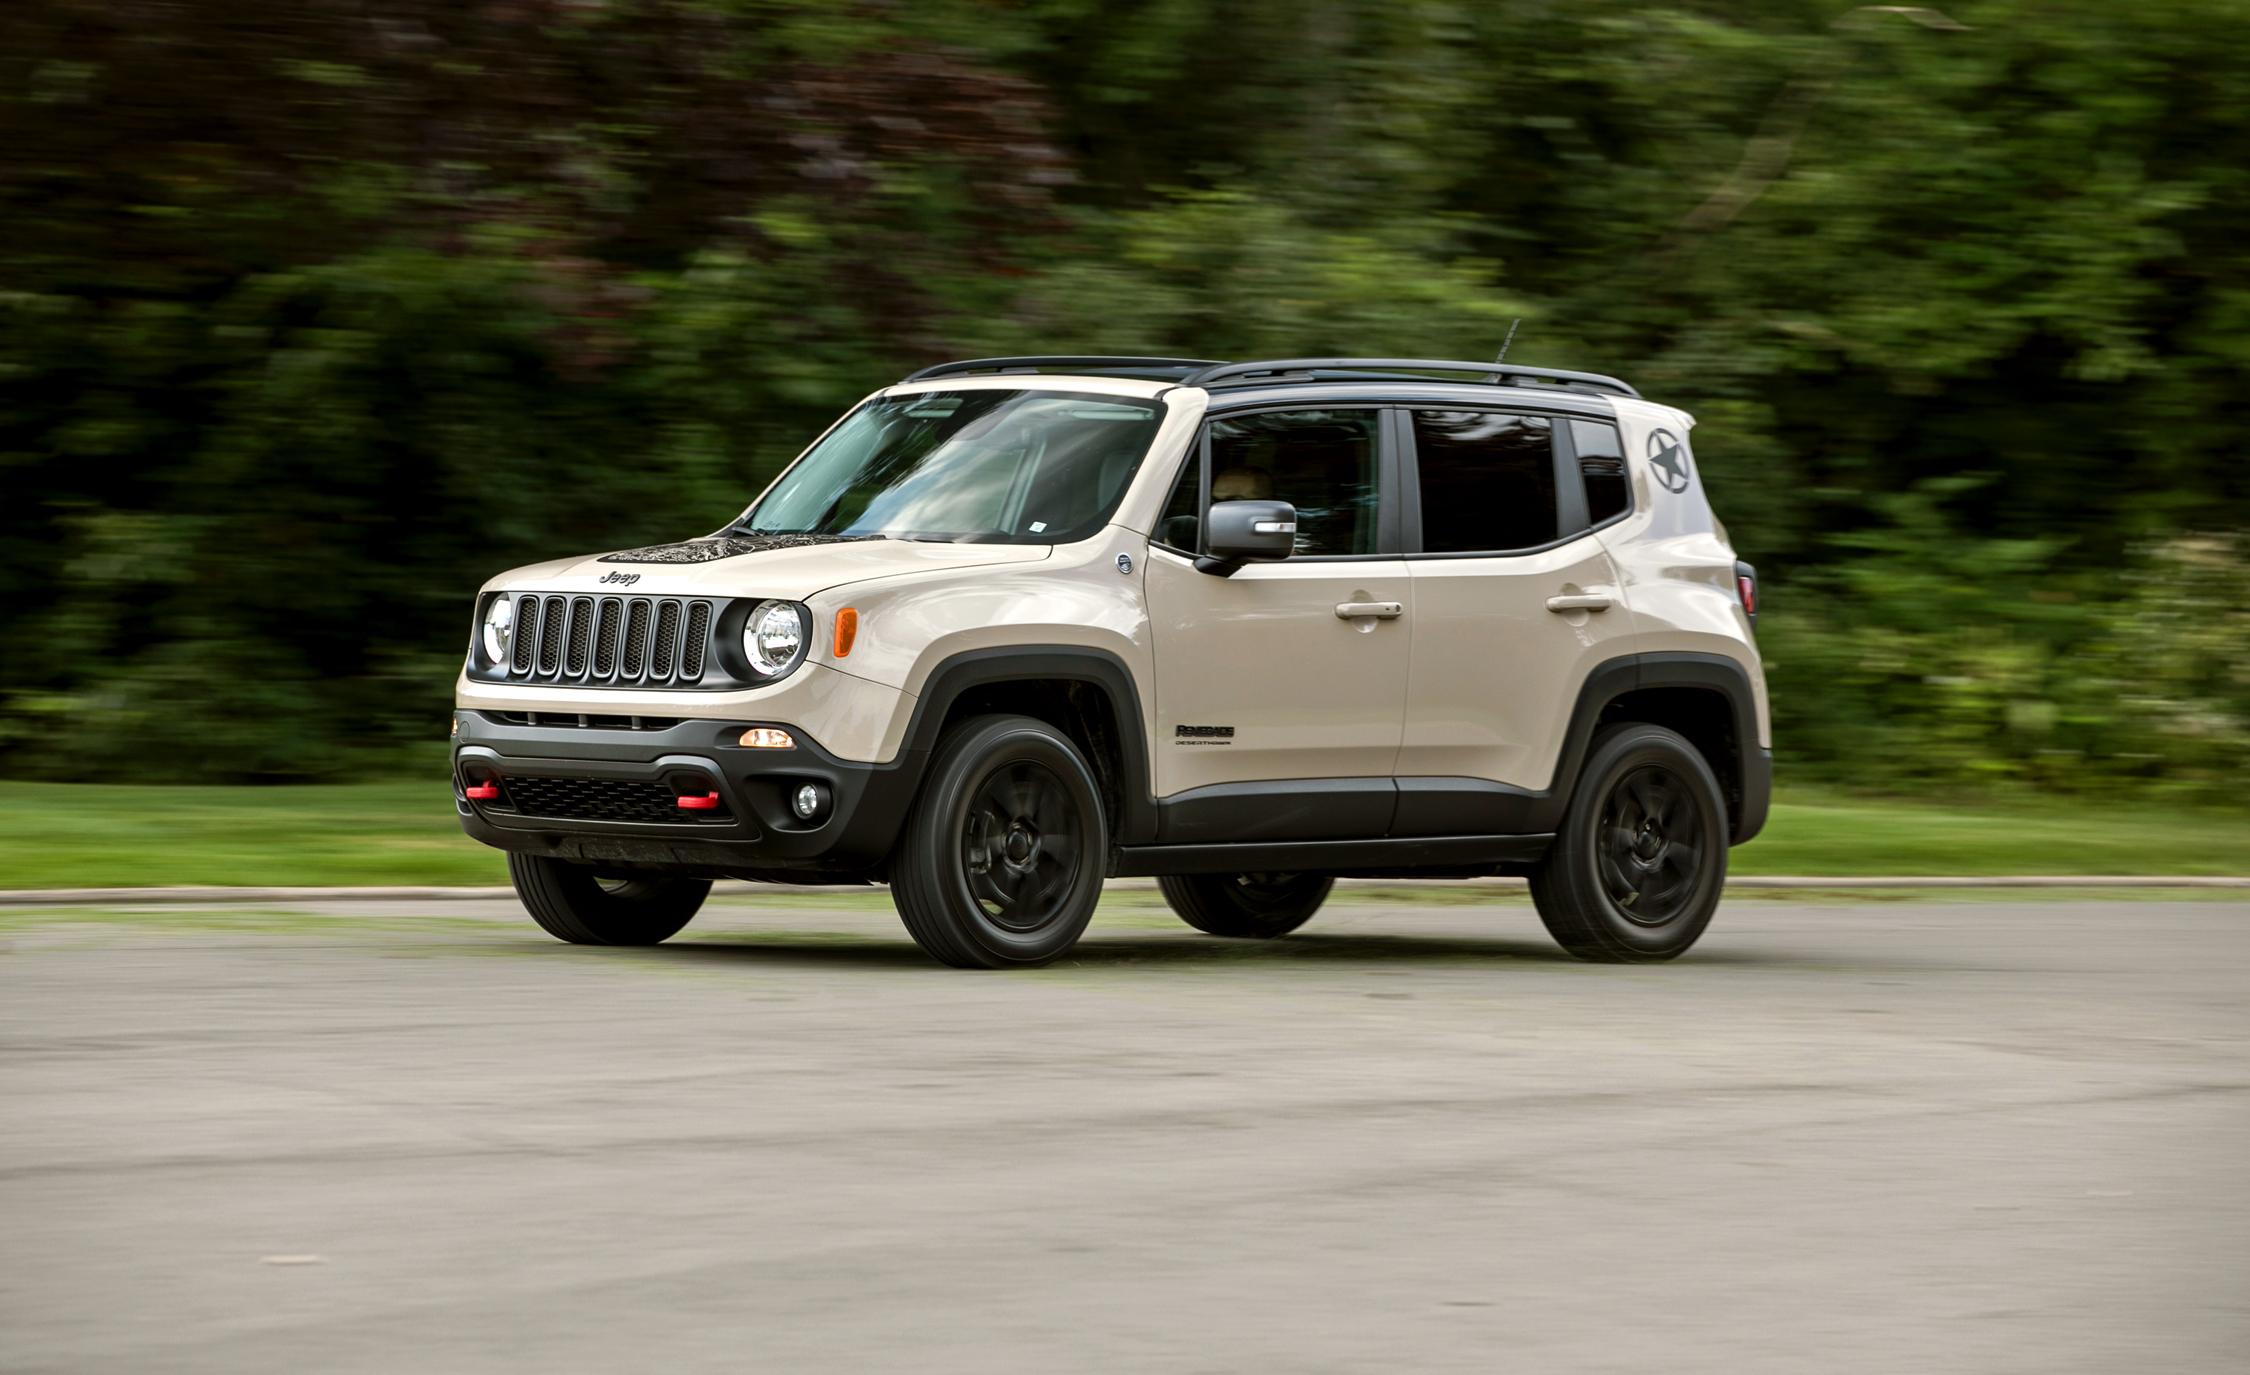 Jeep Renegade 2018, Penantang Sejati Suzuki Jimny